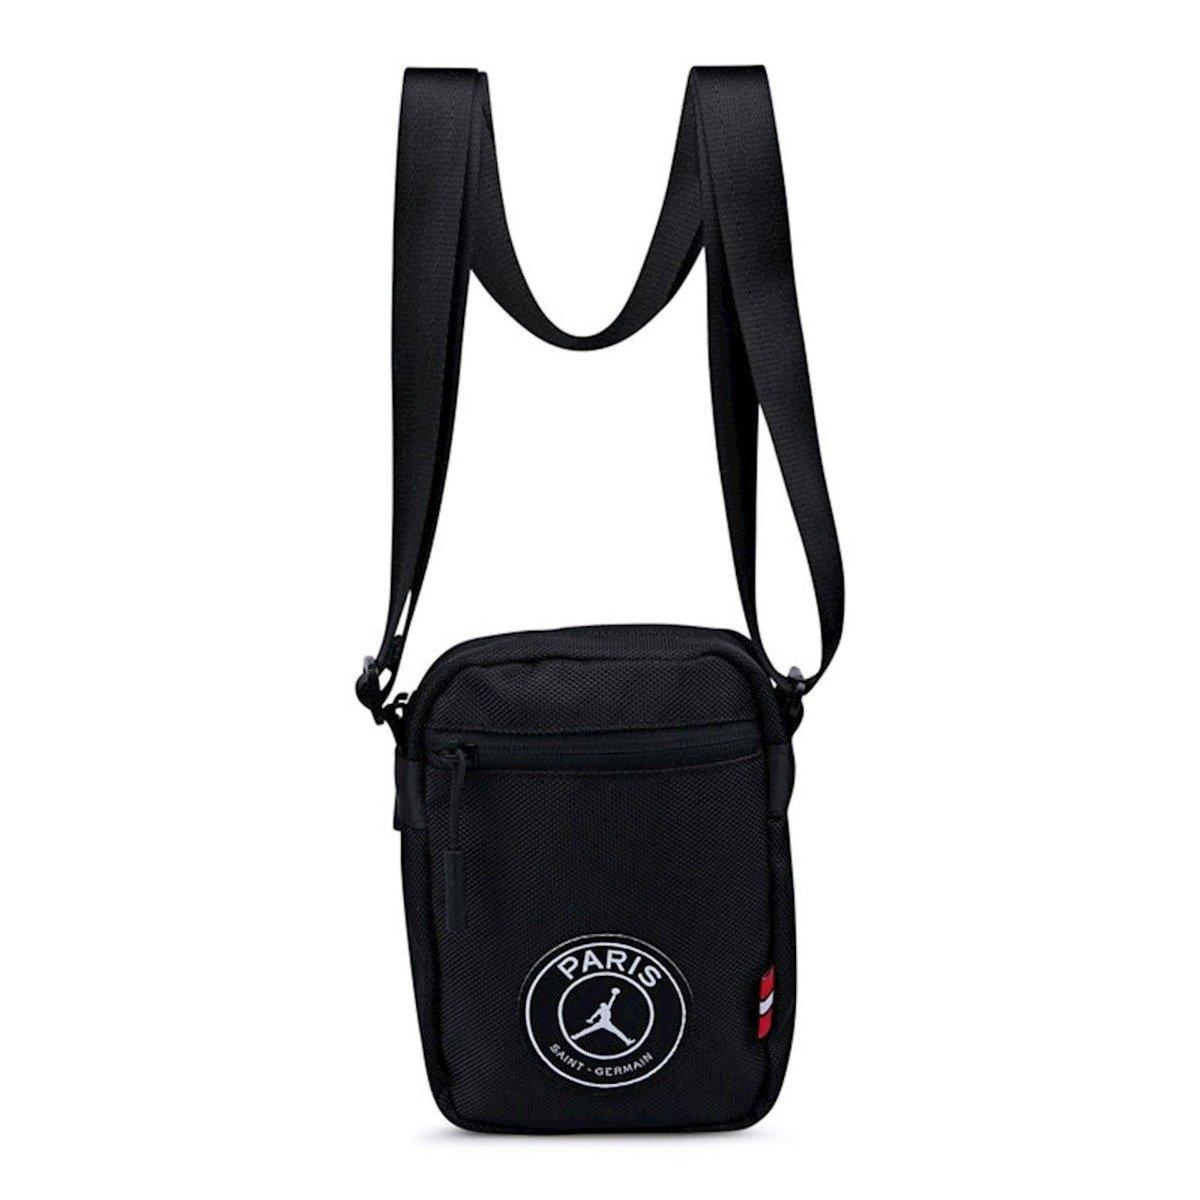 5189ab9f7b5 Air Jordan Paris Saint-Germain Sportsbag - 9A0261-023   Accessories \  Accessories And Basketball Equipment \ Bags And Backpakcs   Sklep  koszykarski Basketo. ...